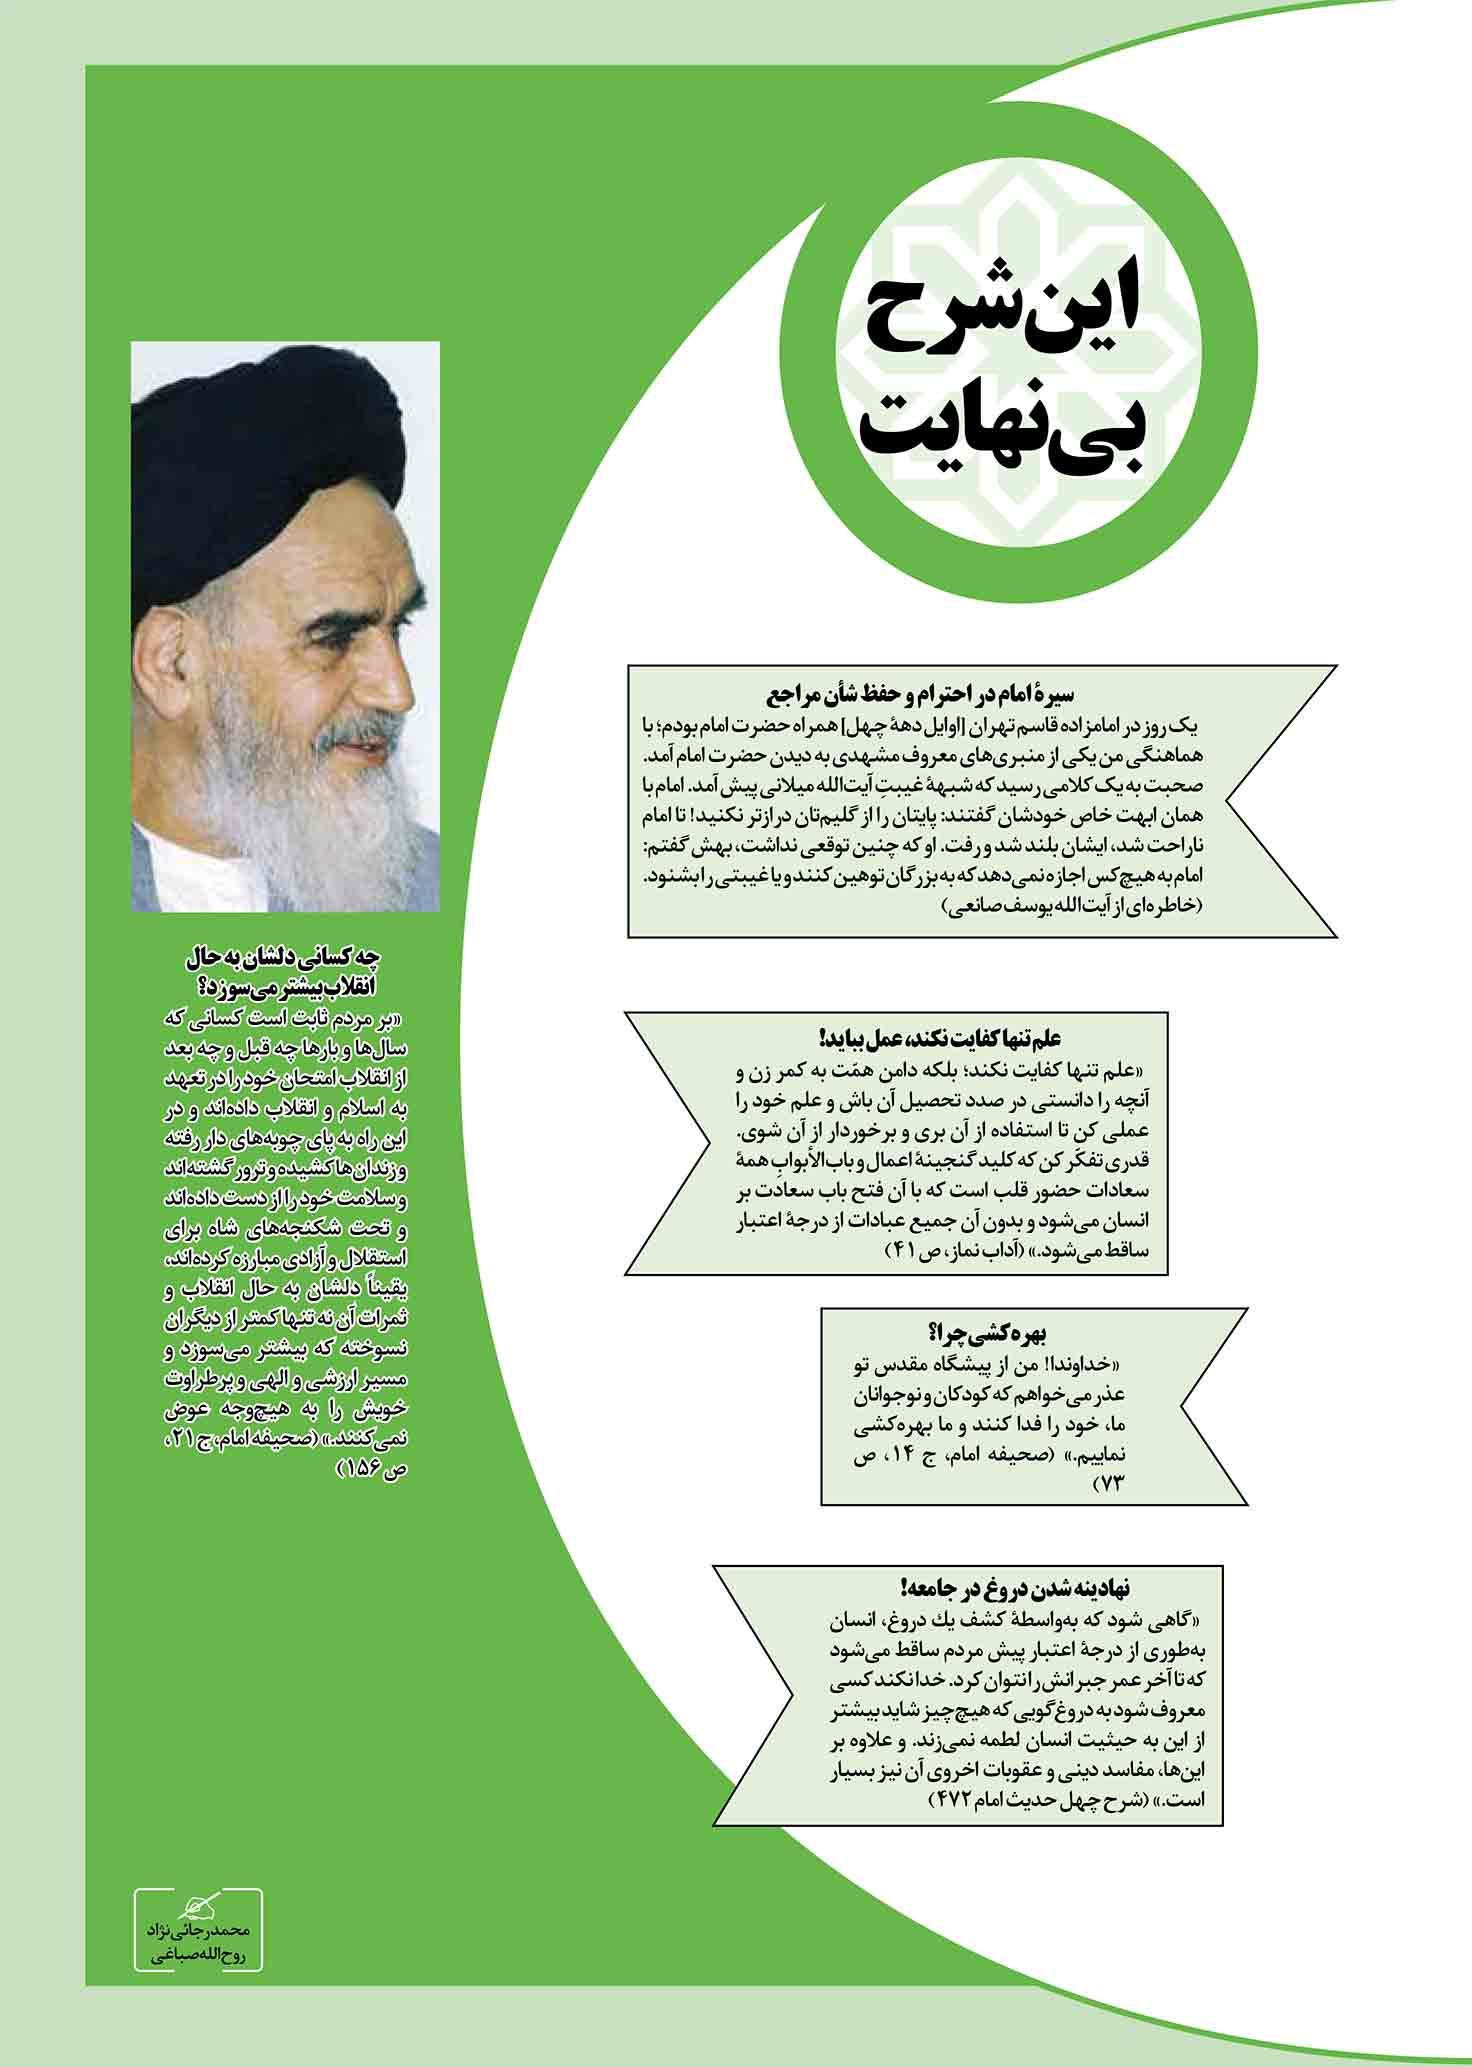 C:\Users\a.khalojini.ICPIKW\Desktop\391\New folder\@harim_emam391-32.jpg